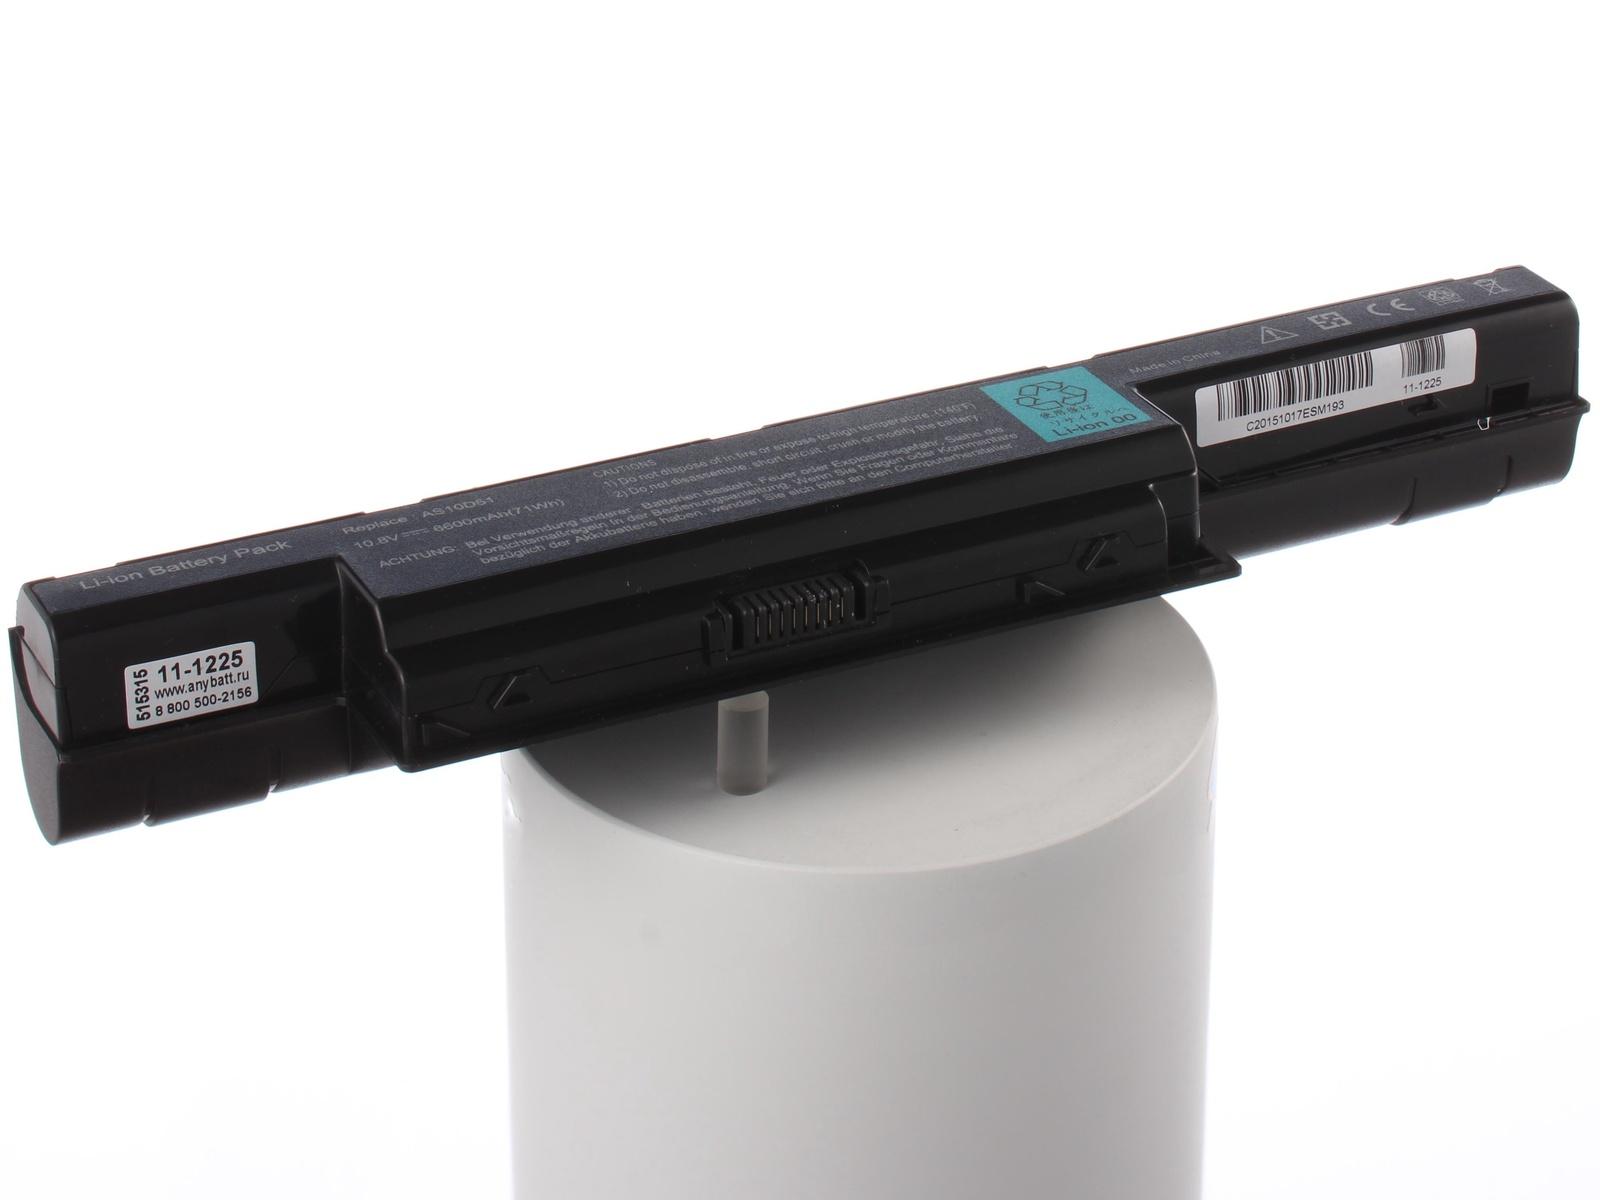 Аккумулятор для ноутбука AnyBatt для Acer eMachines E440, Aspire 7750ZG, TravelMate 5744, TravelMate P253, Aspire E1-532, TravelMate 5760, eMachines G730G, Aspire 5742ZG, Aspire E1-731G, Aspire 7552G, Aspire E1-731, Aspire 5253G аккумулятор для ноутбука anybatt для acer emachines e732 382g32mikk emachines e732g 332g25mikk emachines g730zg p622g32miks travelmate 5735 travelmate 5742zg travelmate 8472t travelmate p273 m aspire 4738z